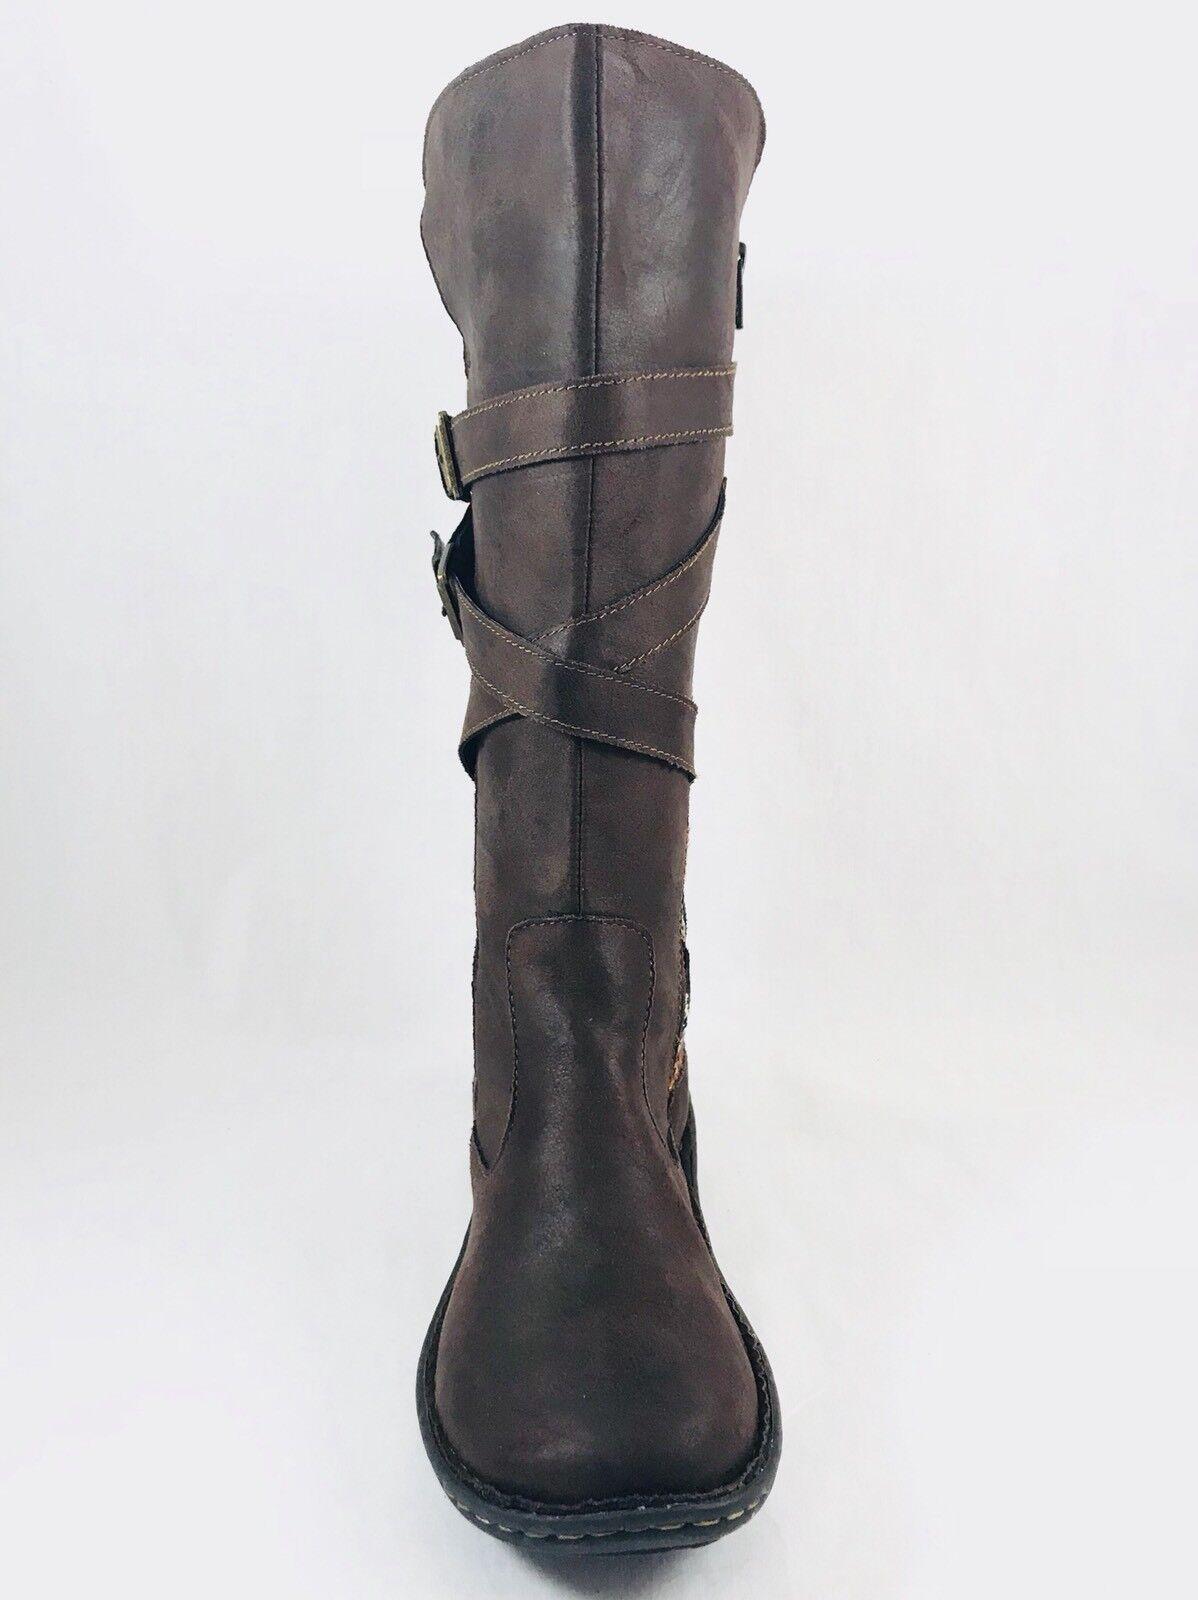 Born Concepts B.O.C. Marghera Mid Stiefel Side Zip Dark Braun Damenschuhe Sz 9